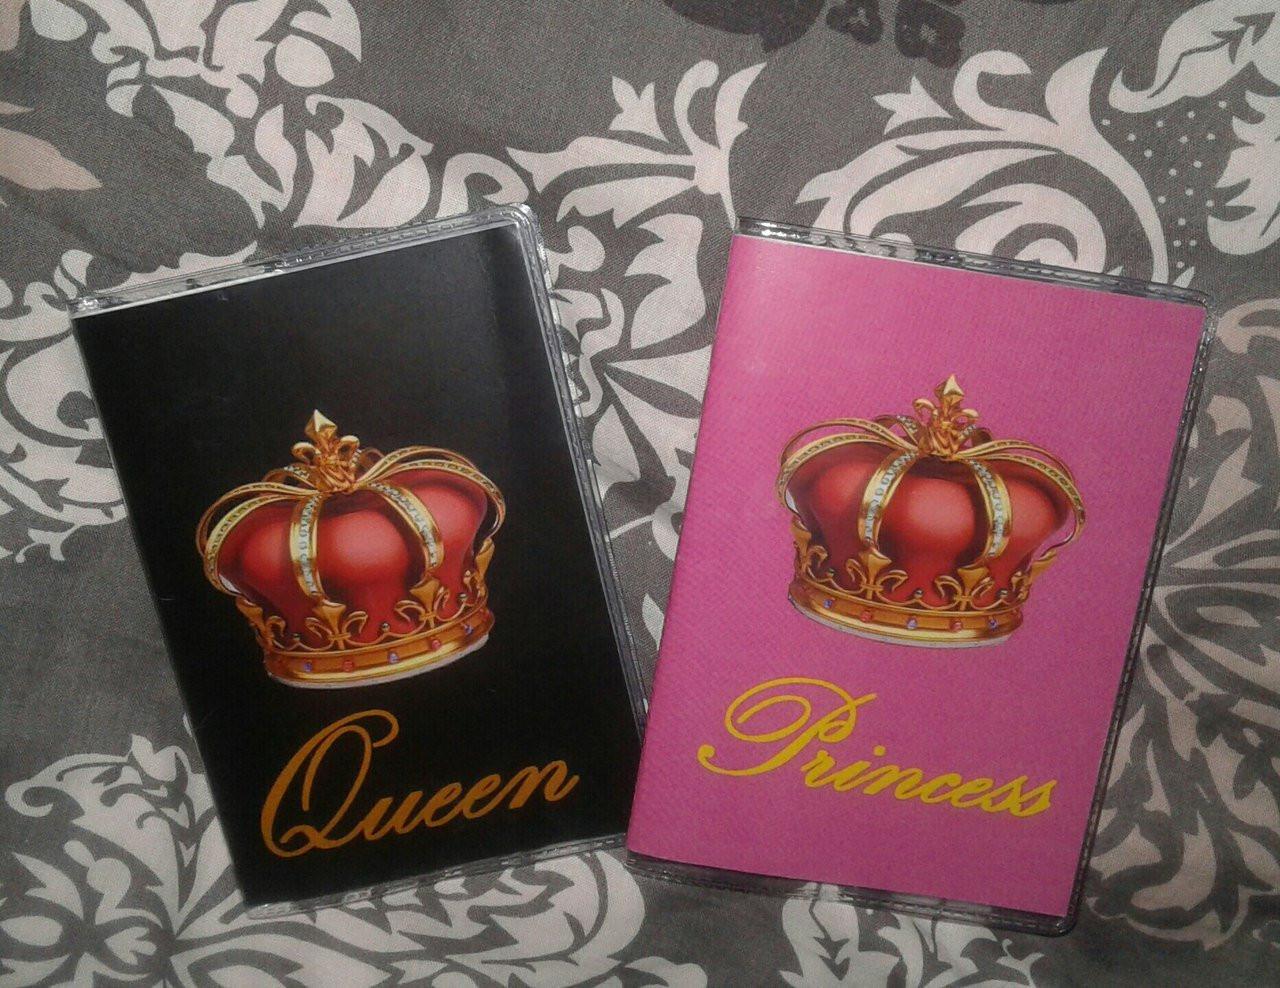 Обложка обкладинка на паспорт Queen & Princess 2 шт